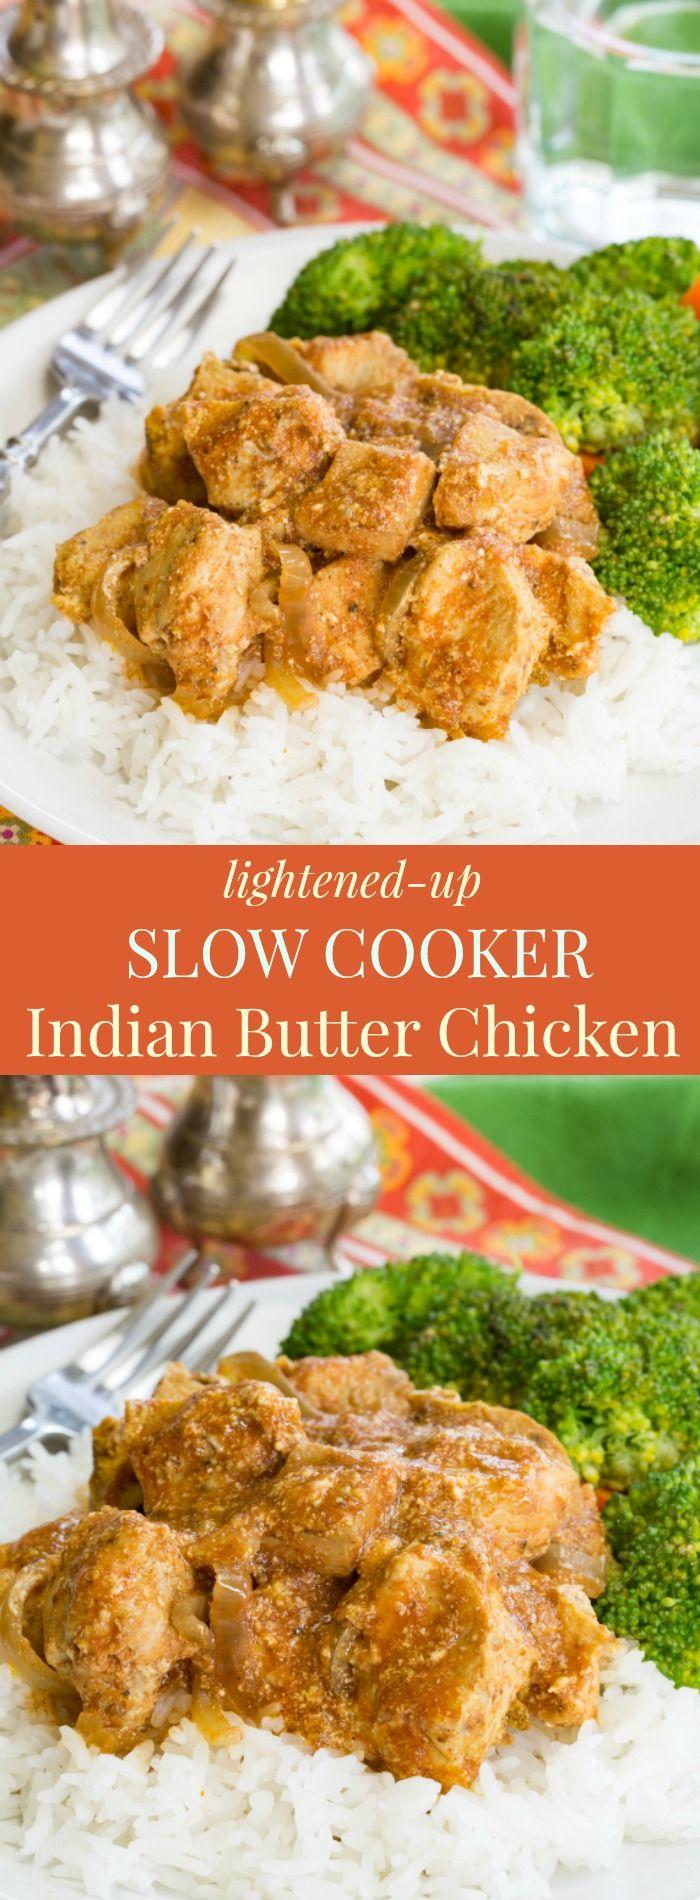 how to make butter chicken healthier